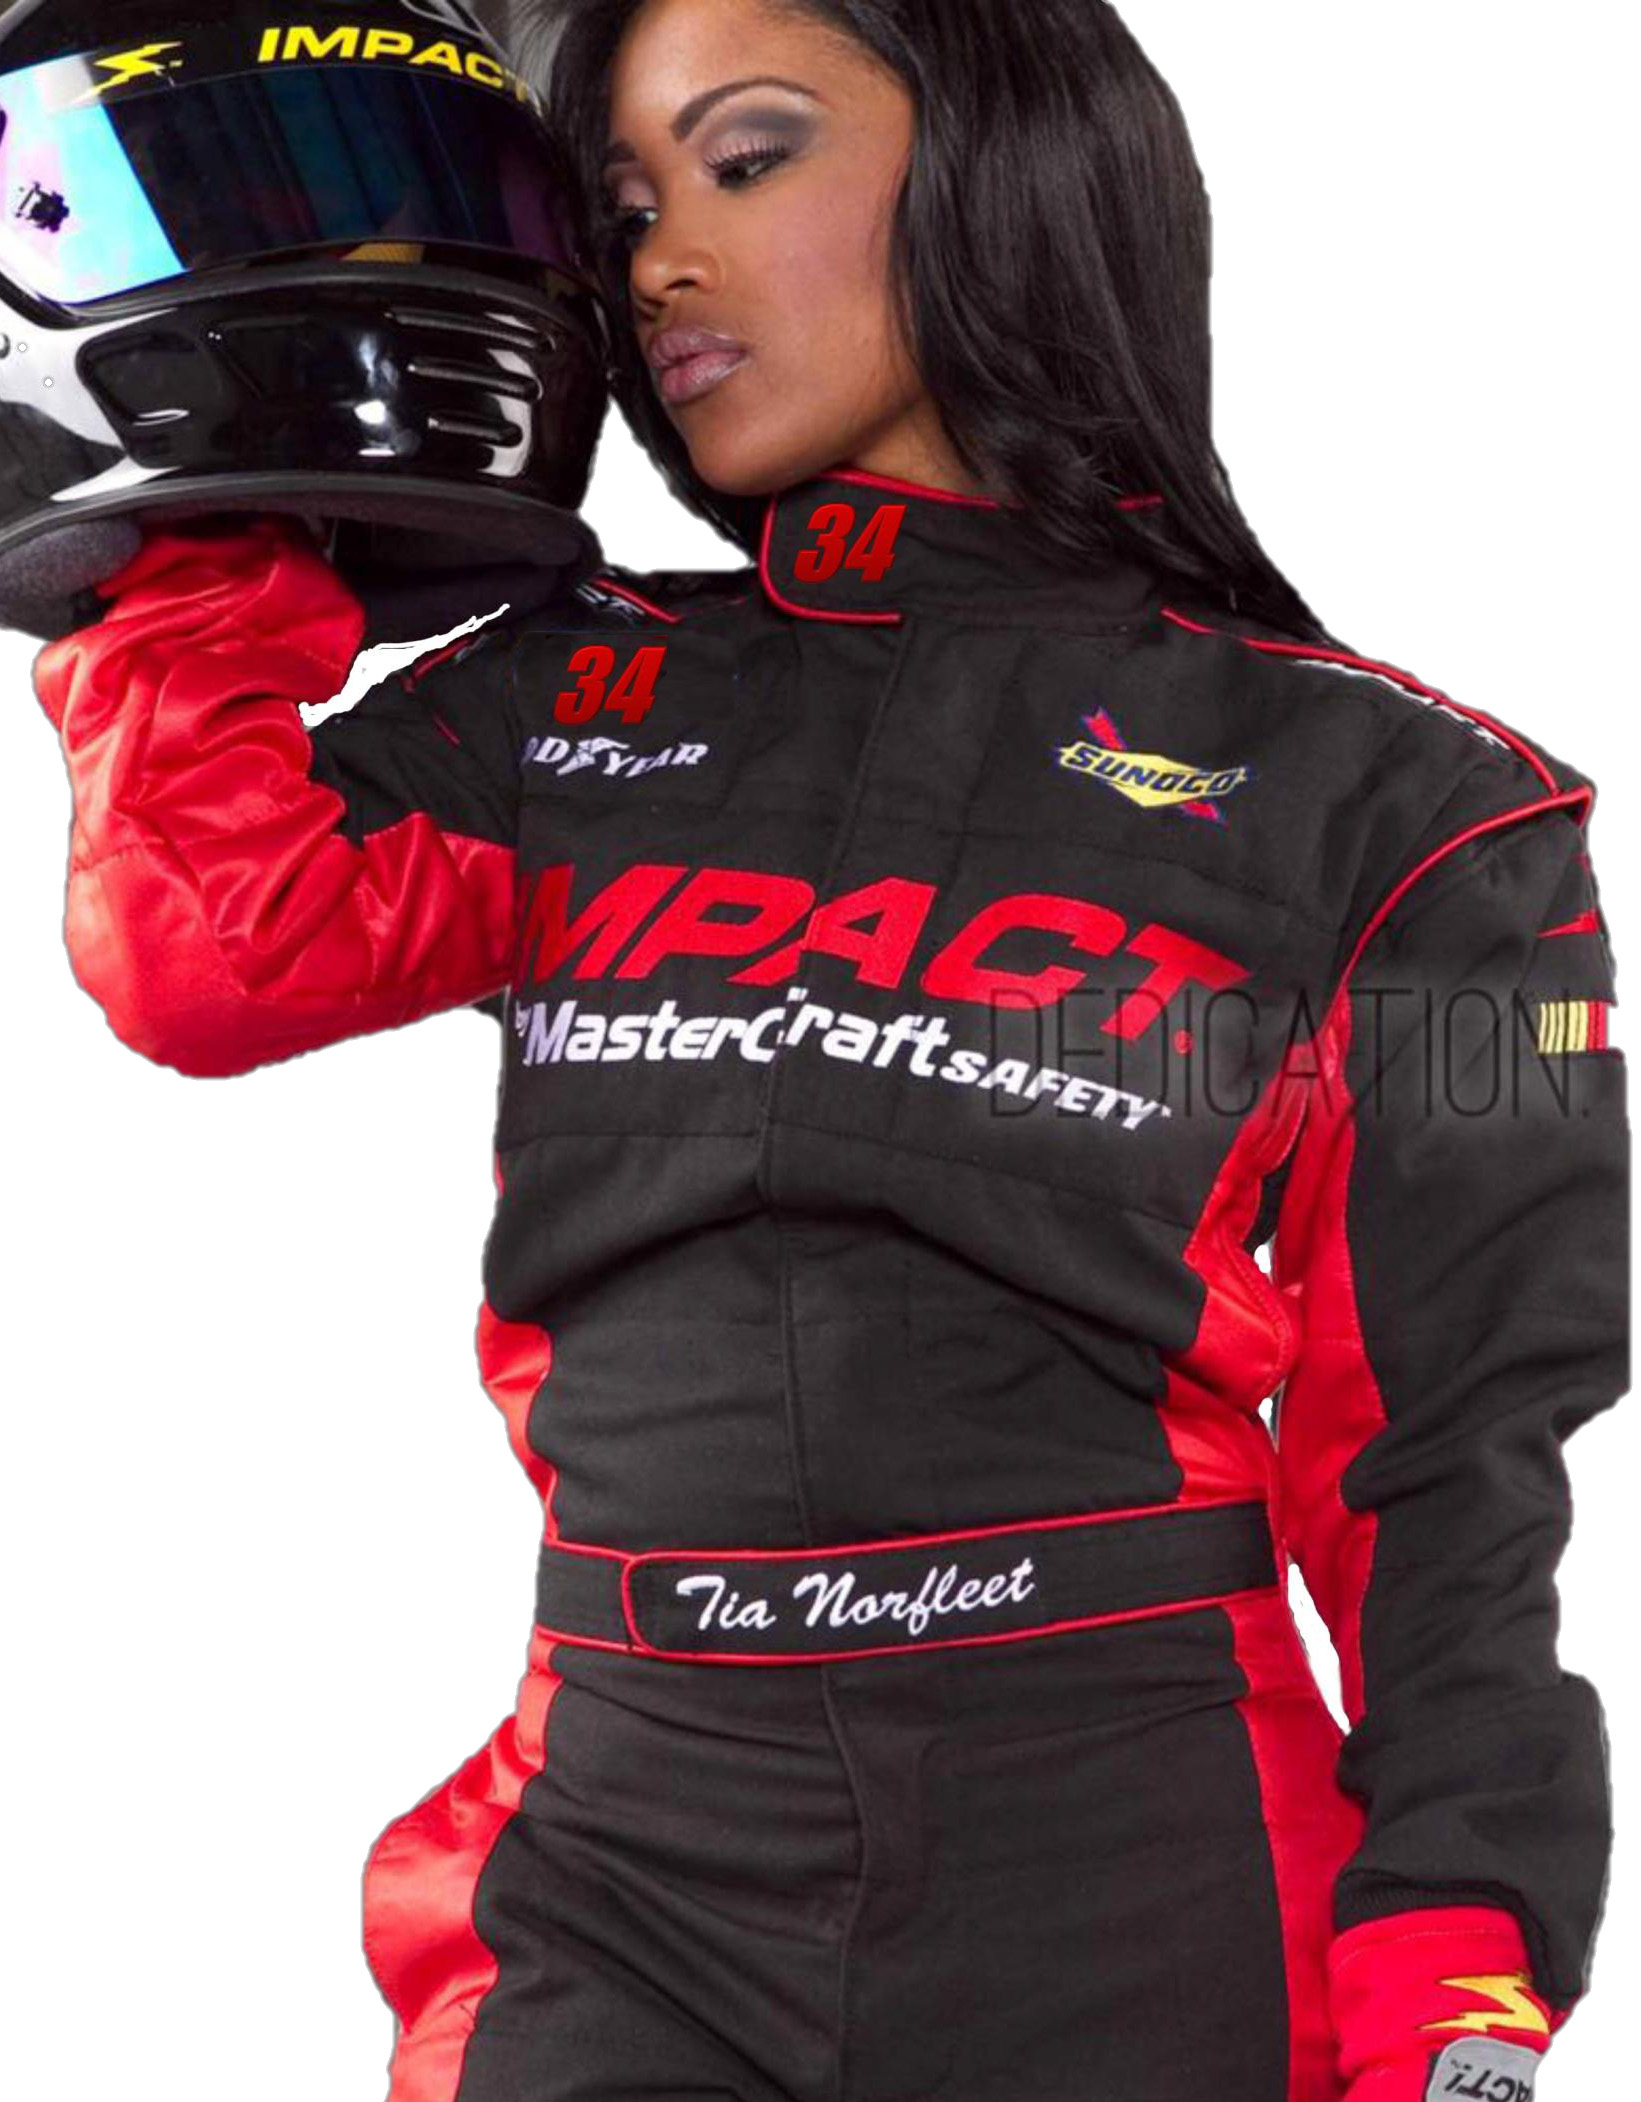 Tia Norfleet to Return to NASCAR - Fact or Fiction?